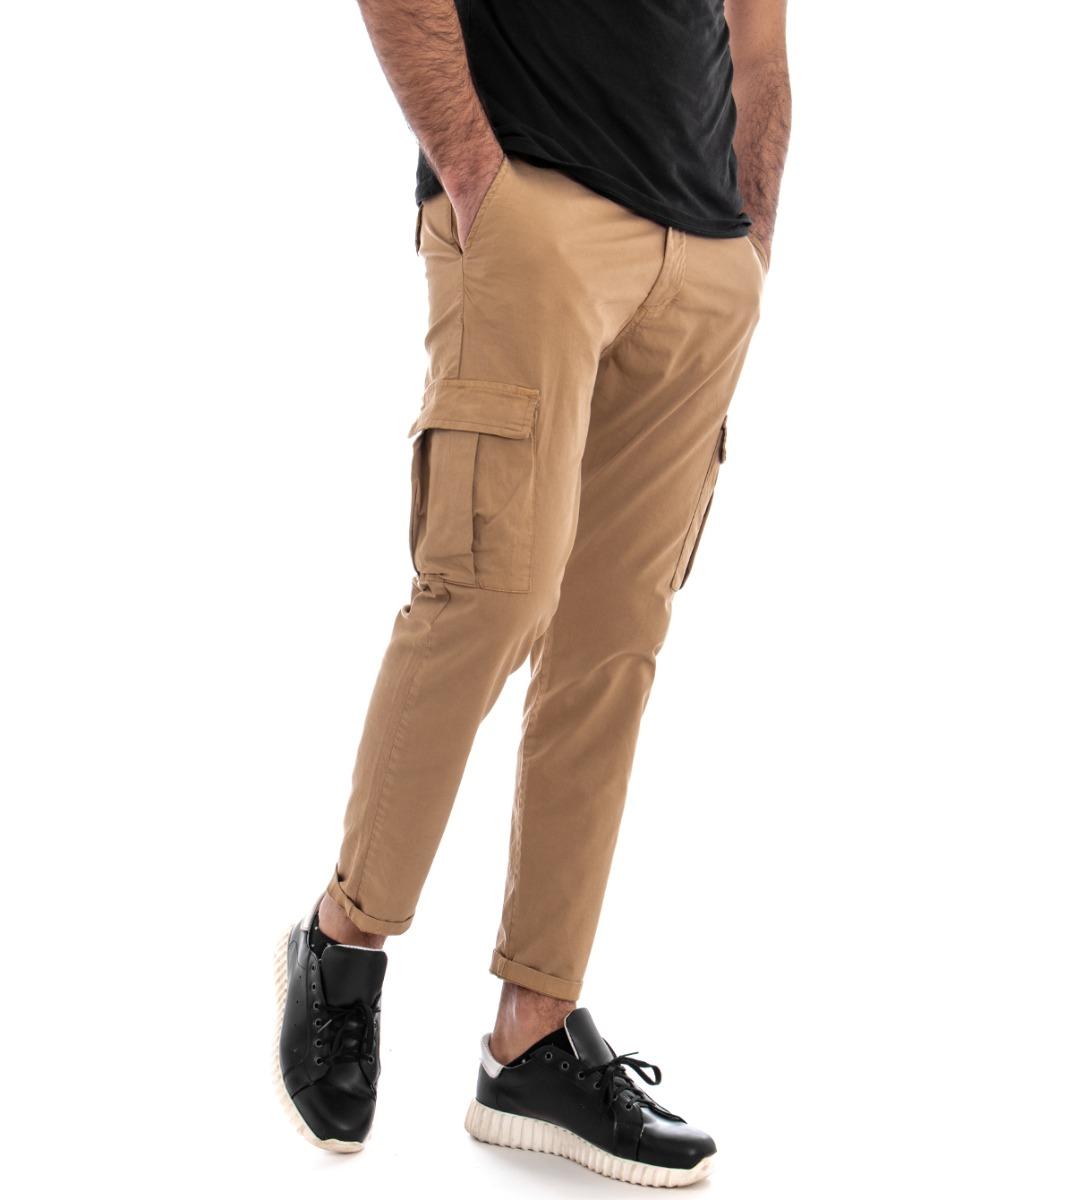 Pantalone-Uomo-Cargo-Tasca-America-Kaki-Tinta-Unita-Cotone-Casual-GIOSAL miniatura 2